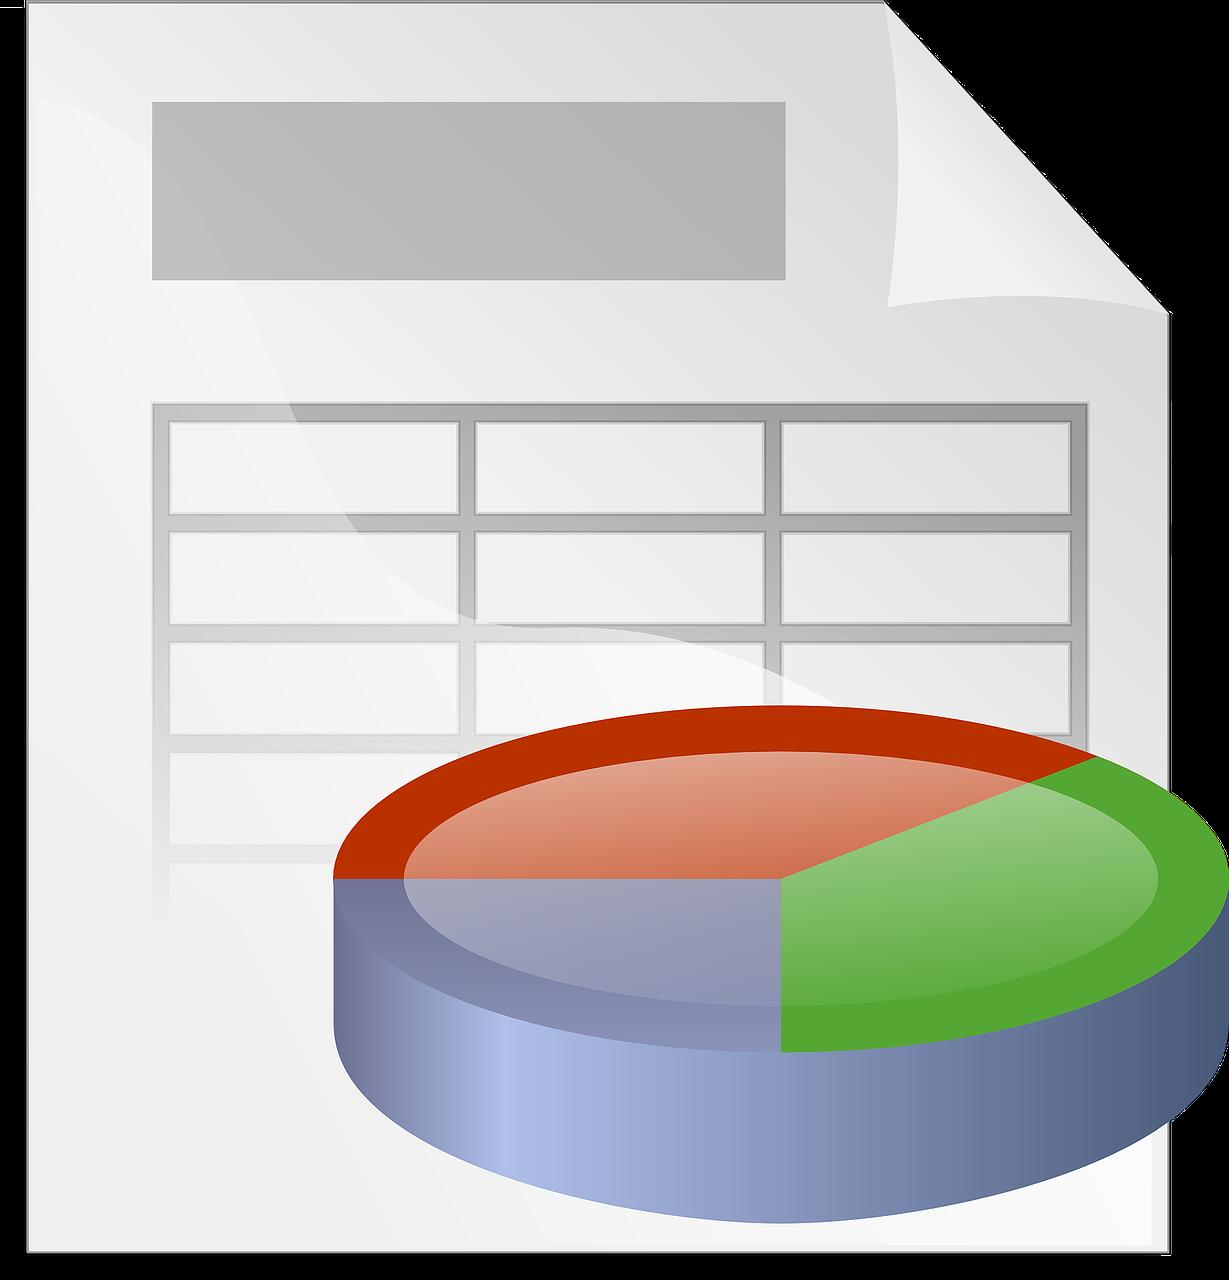 Vektorgrafik zur Tabellenkalkulation (https://pixabay.com/de/vectors/tabellen-grafik-gesch%C3%A4ft-bericht-24956/)